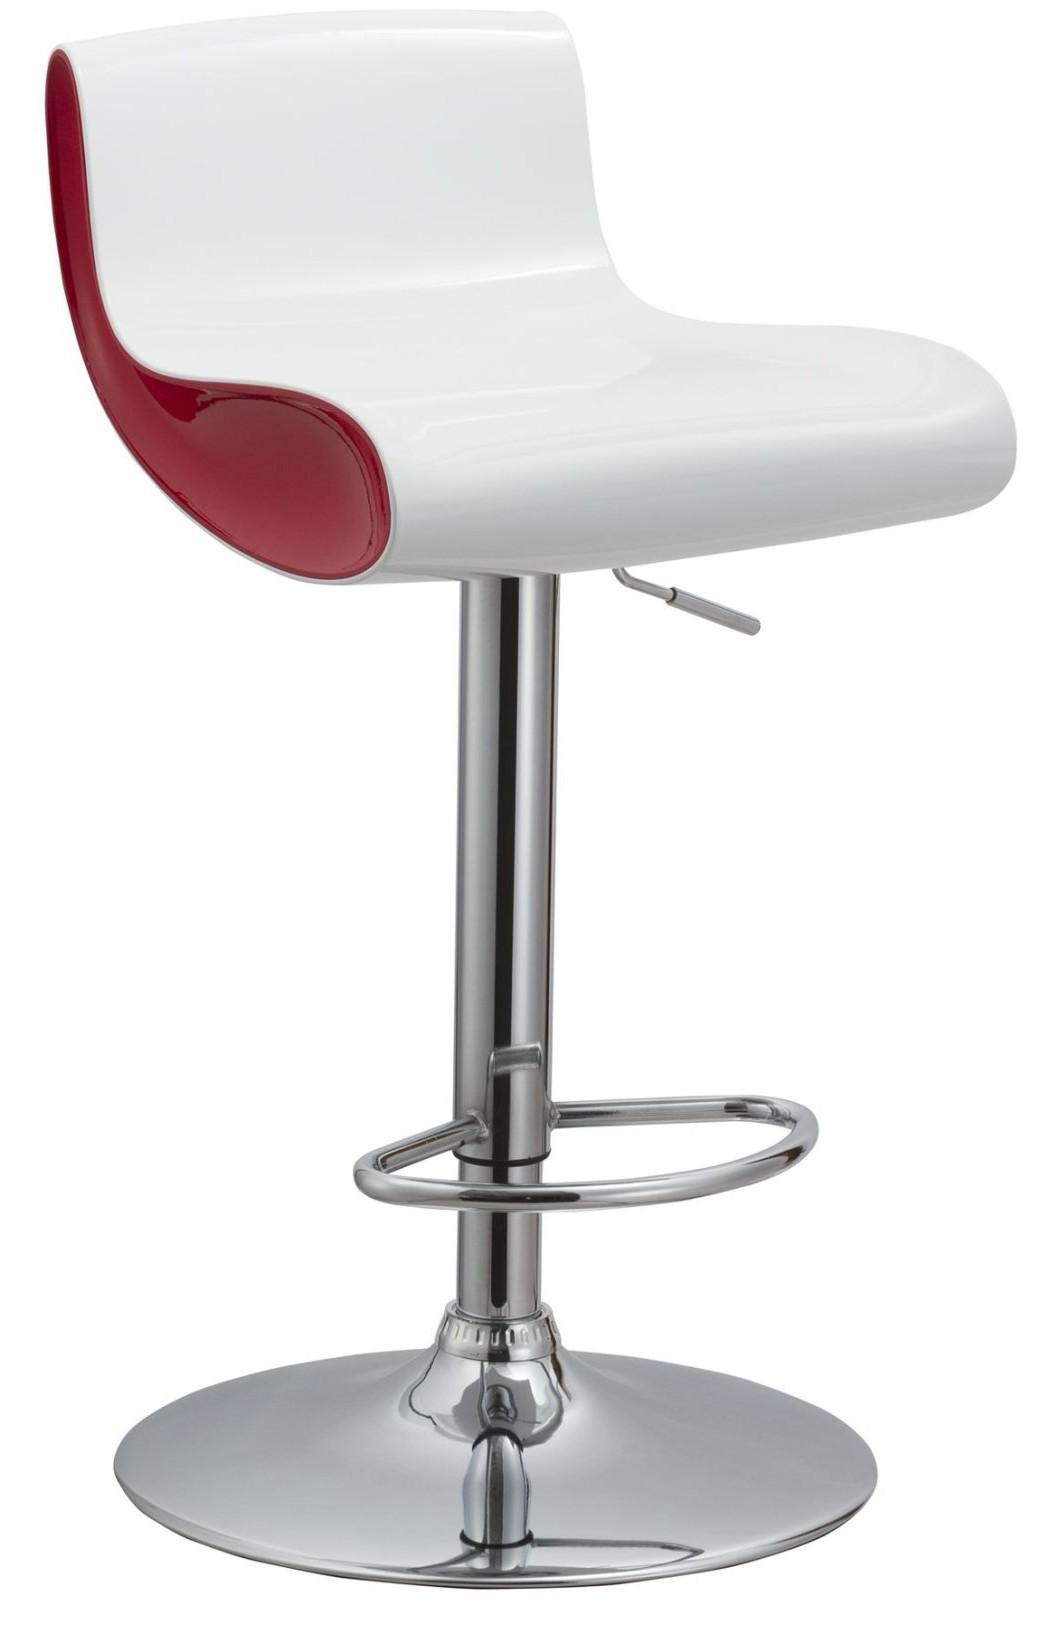 Chaise De Bar Reglable Alinea